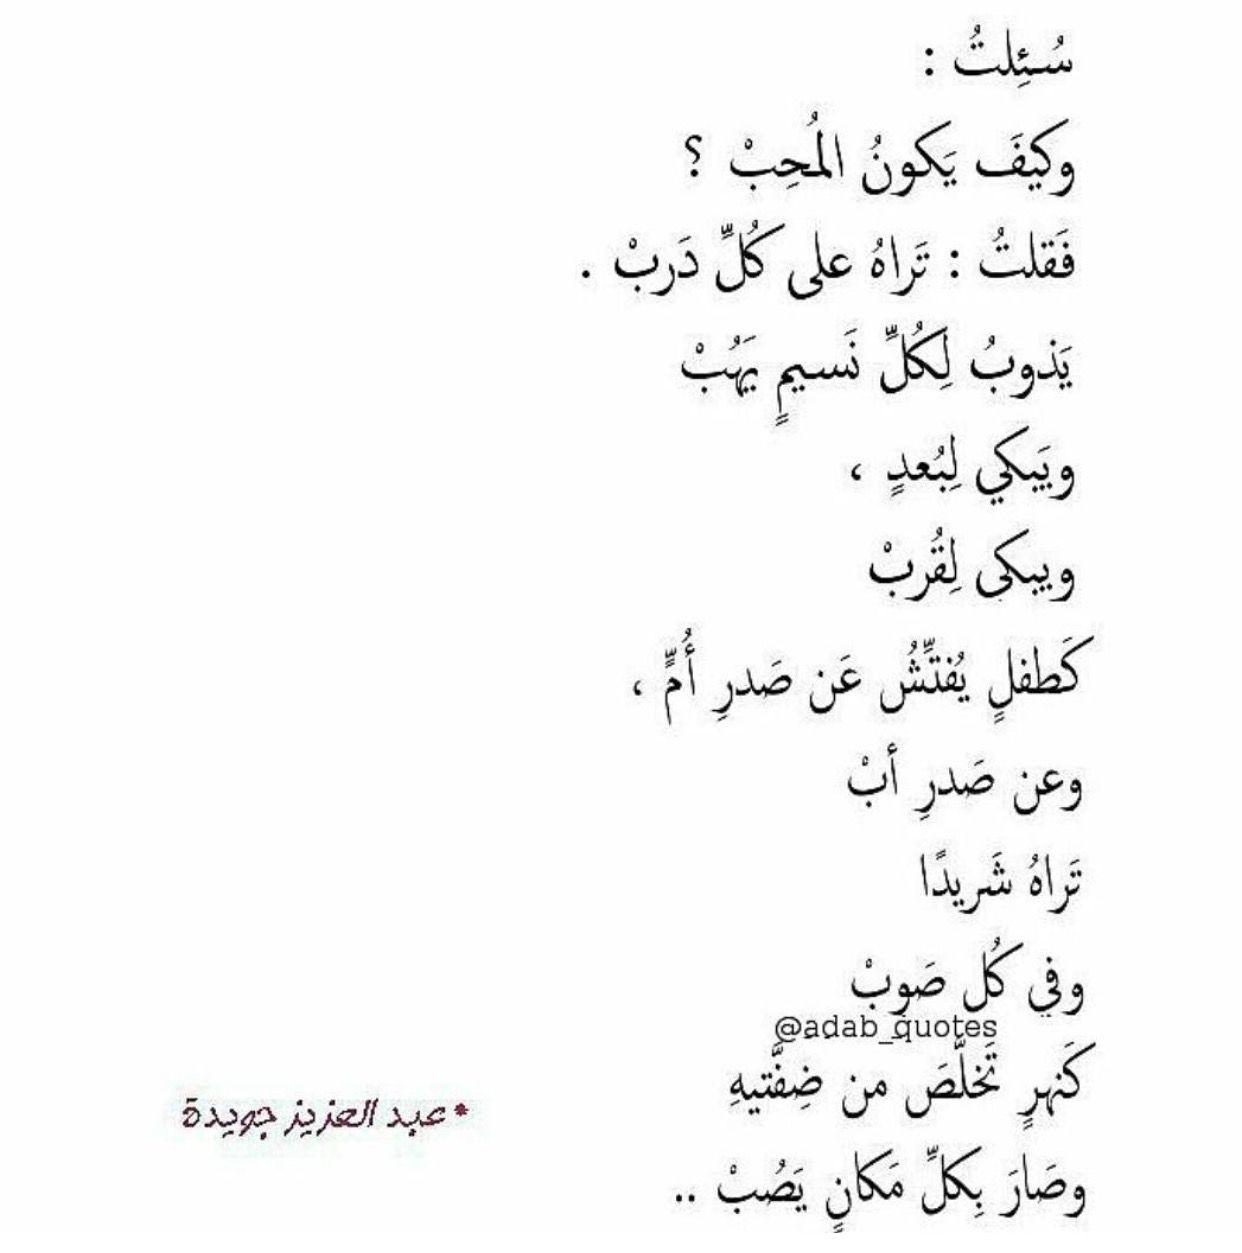 Pin By كل جميل قصير On أشعار Arabic Poetry Arabic Words Arabic Quotes